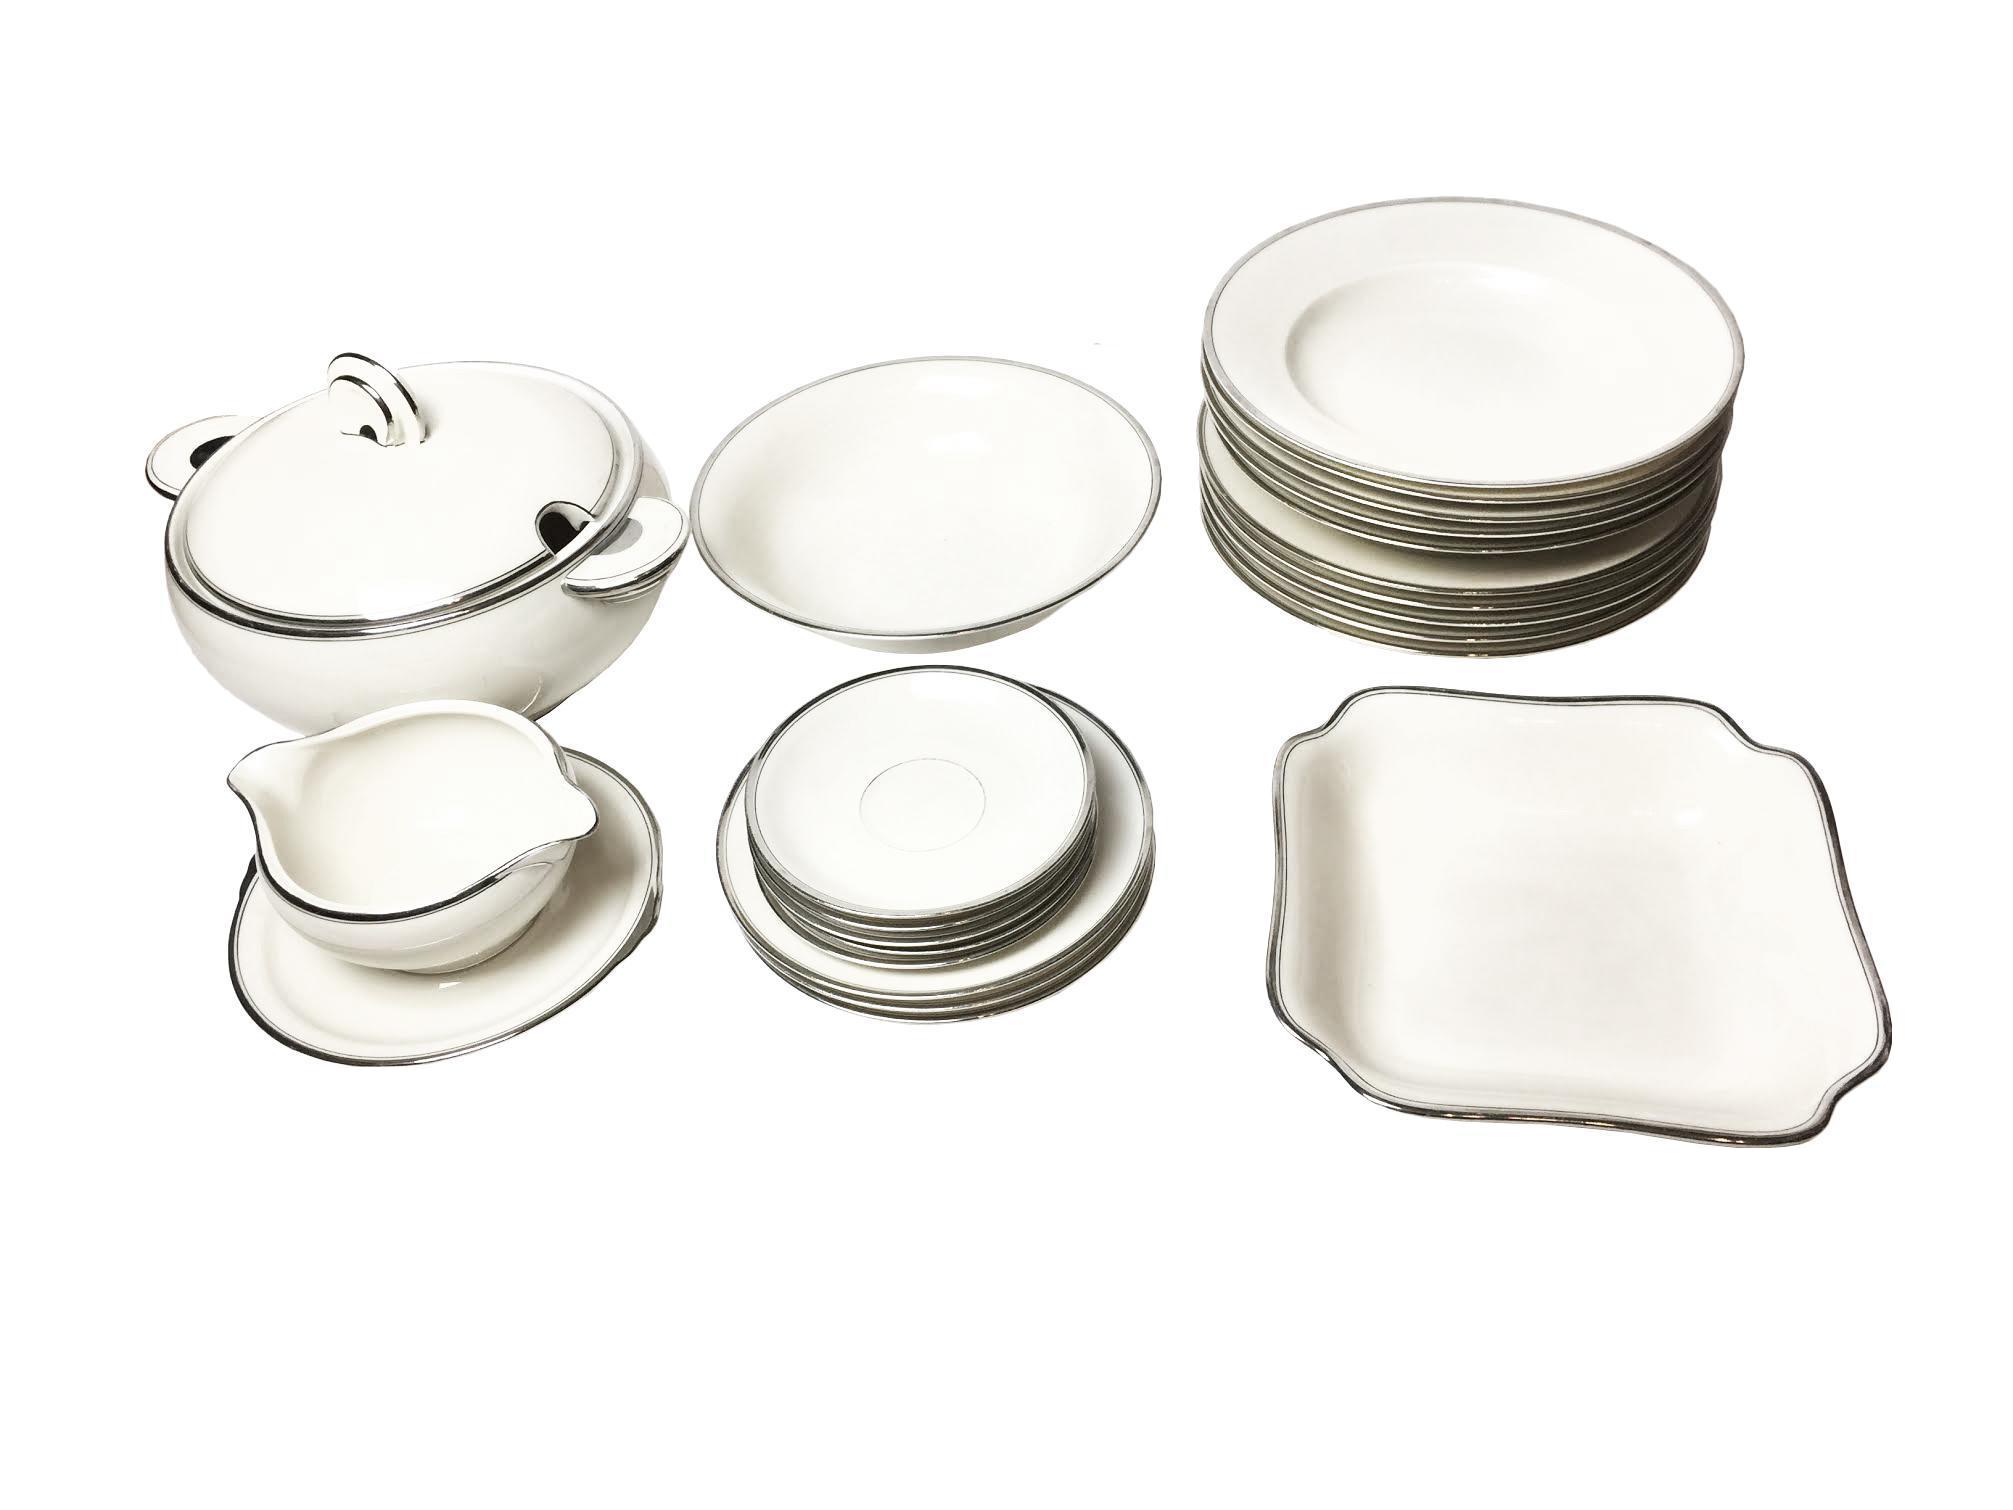 1920s Vintage Art Deco Style White \u0026 Silver Dinnerware Set - 22 Pieces  sc 1 st  Chairish & 1920s Vintage Art Deco Style White \u0026 Silver Dinnerware Set - 22 ...